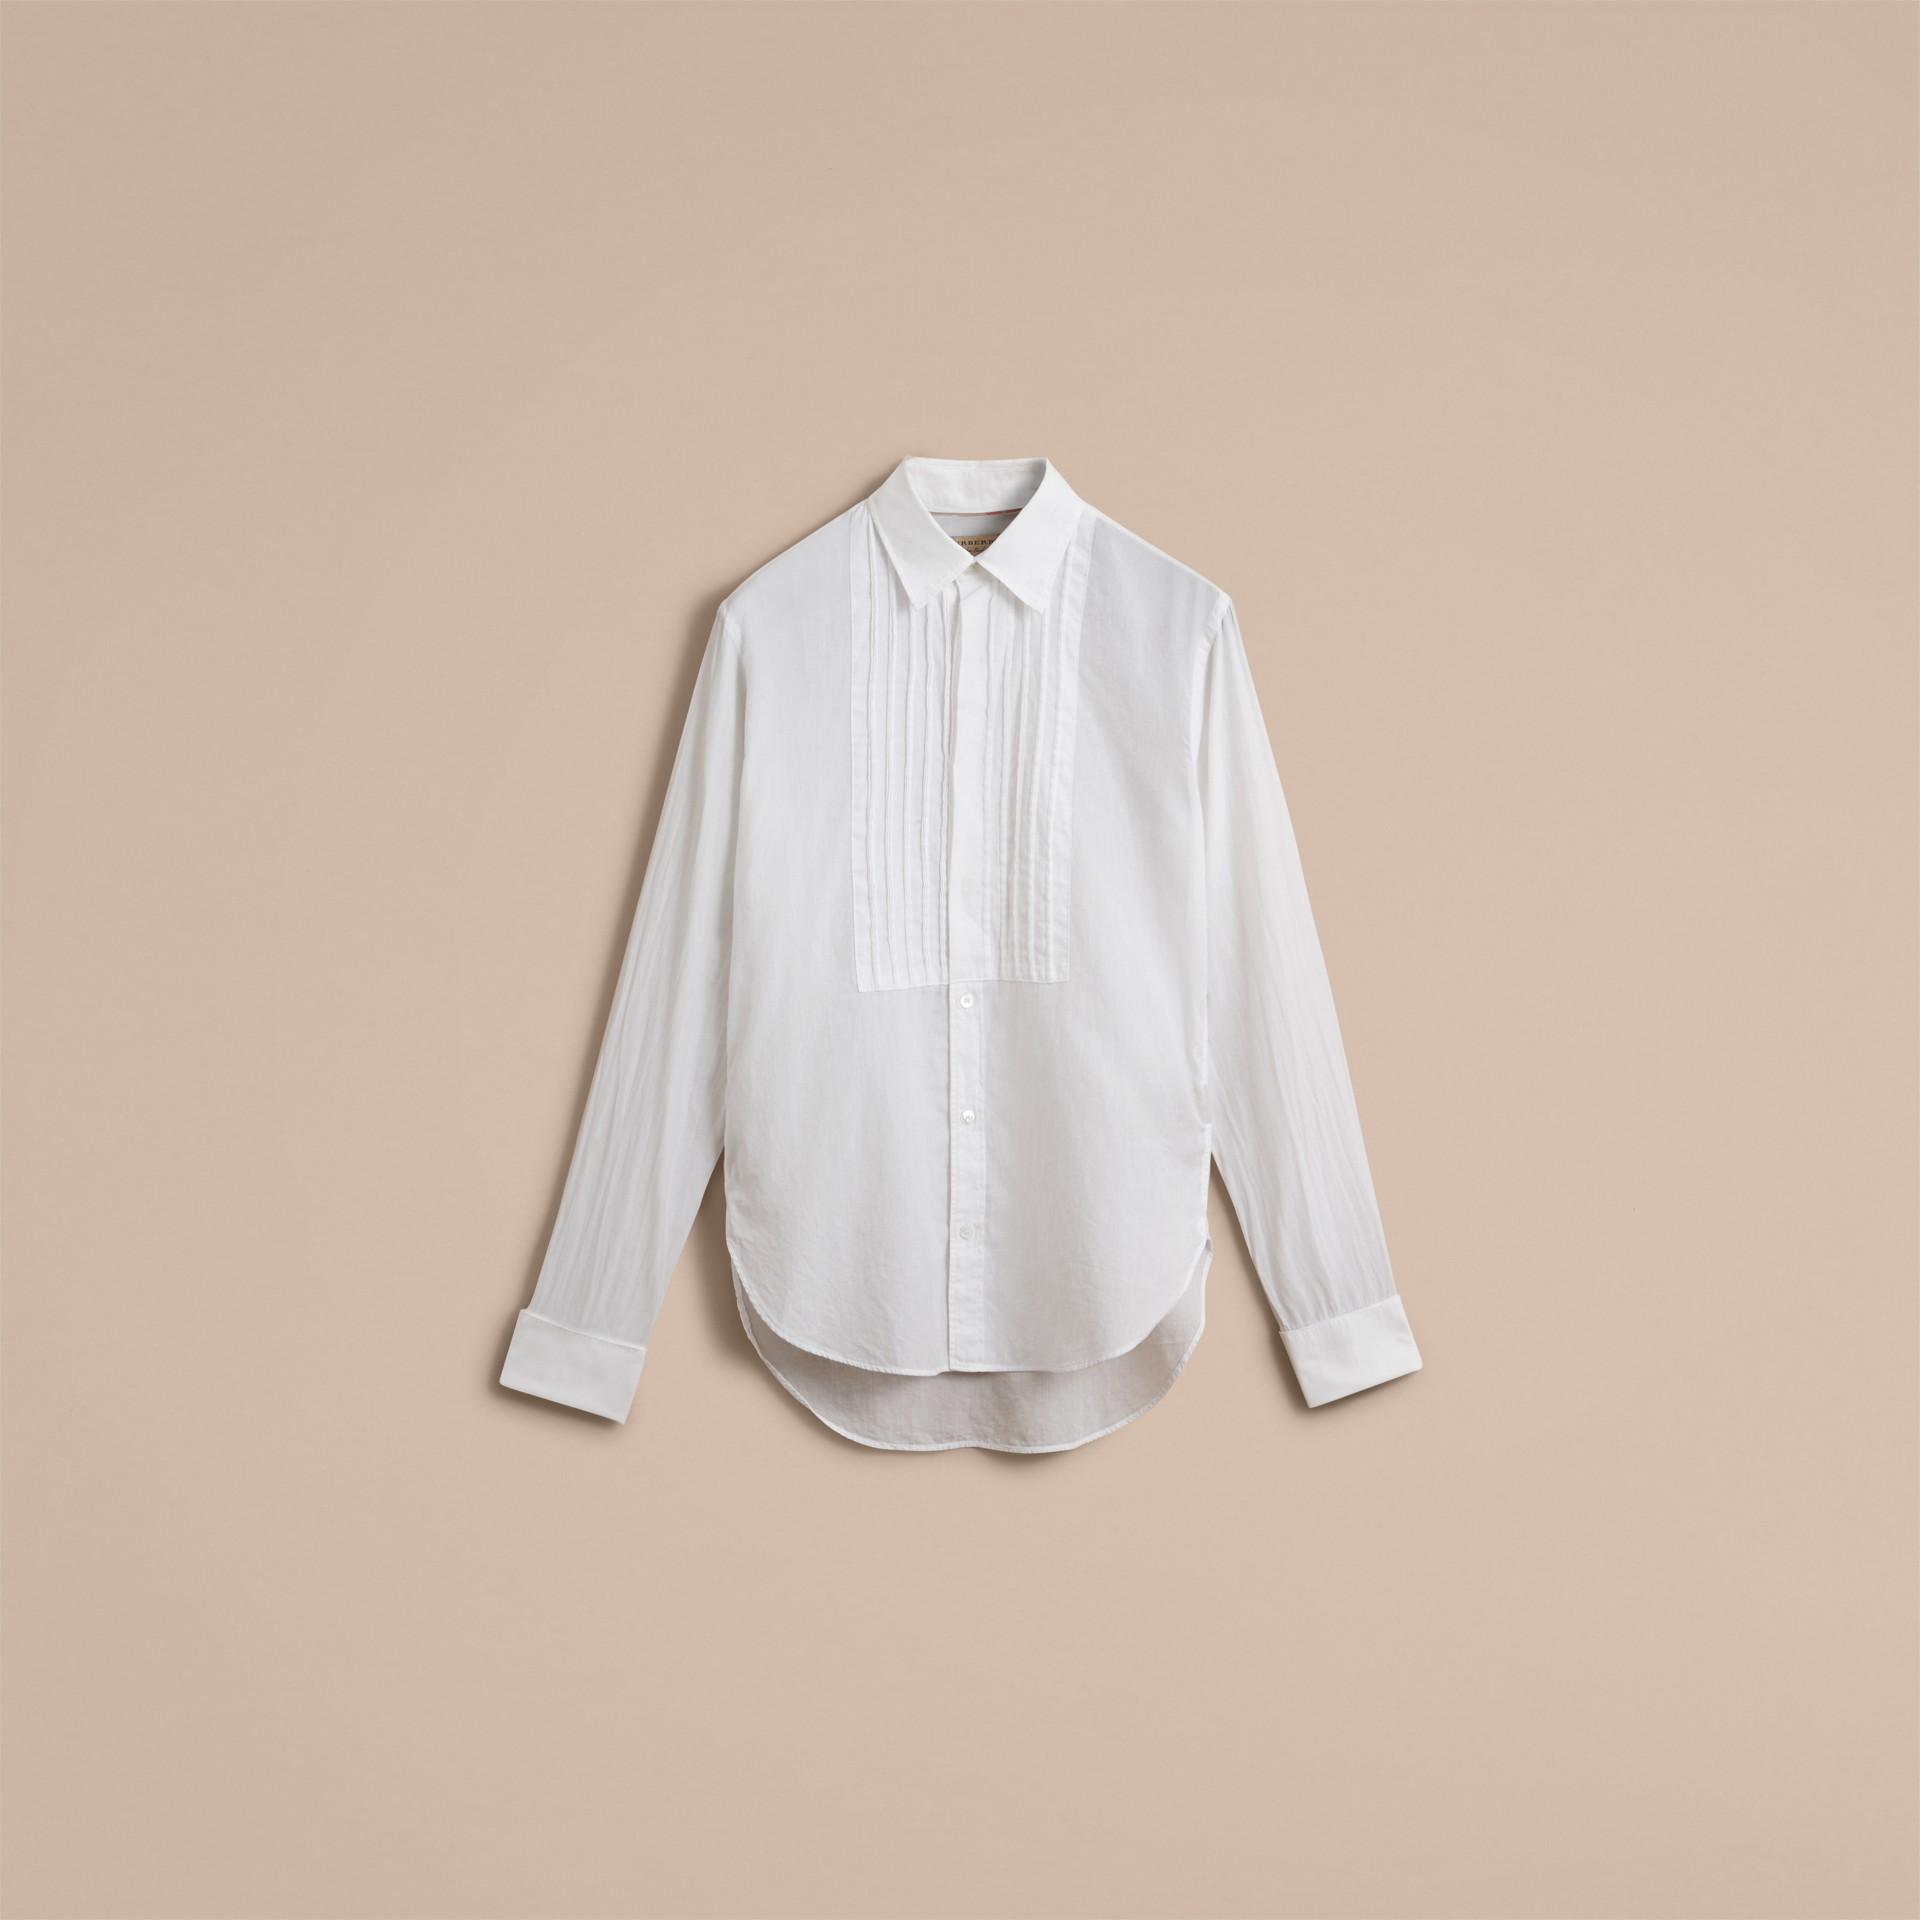 Unisex Double-cuff Pintuck Bib Cotton Shirt White - gallery image 4